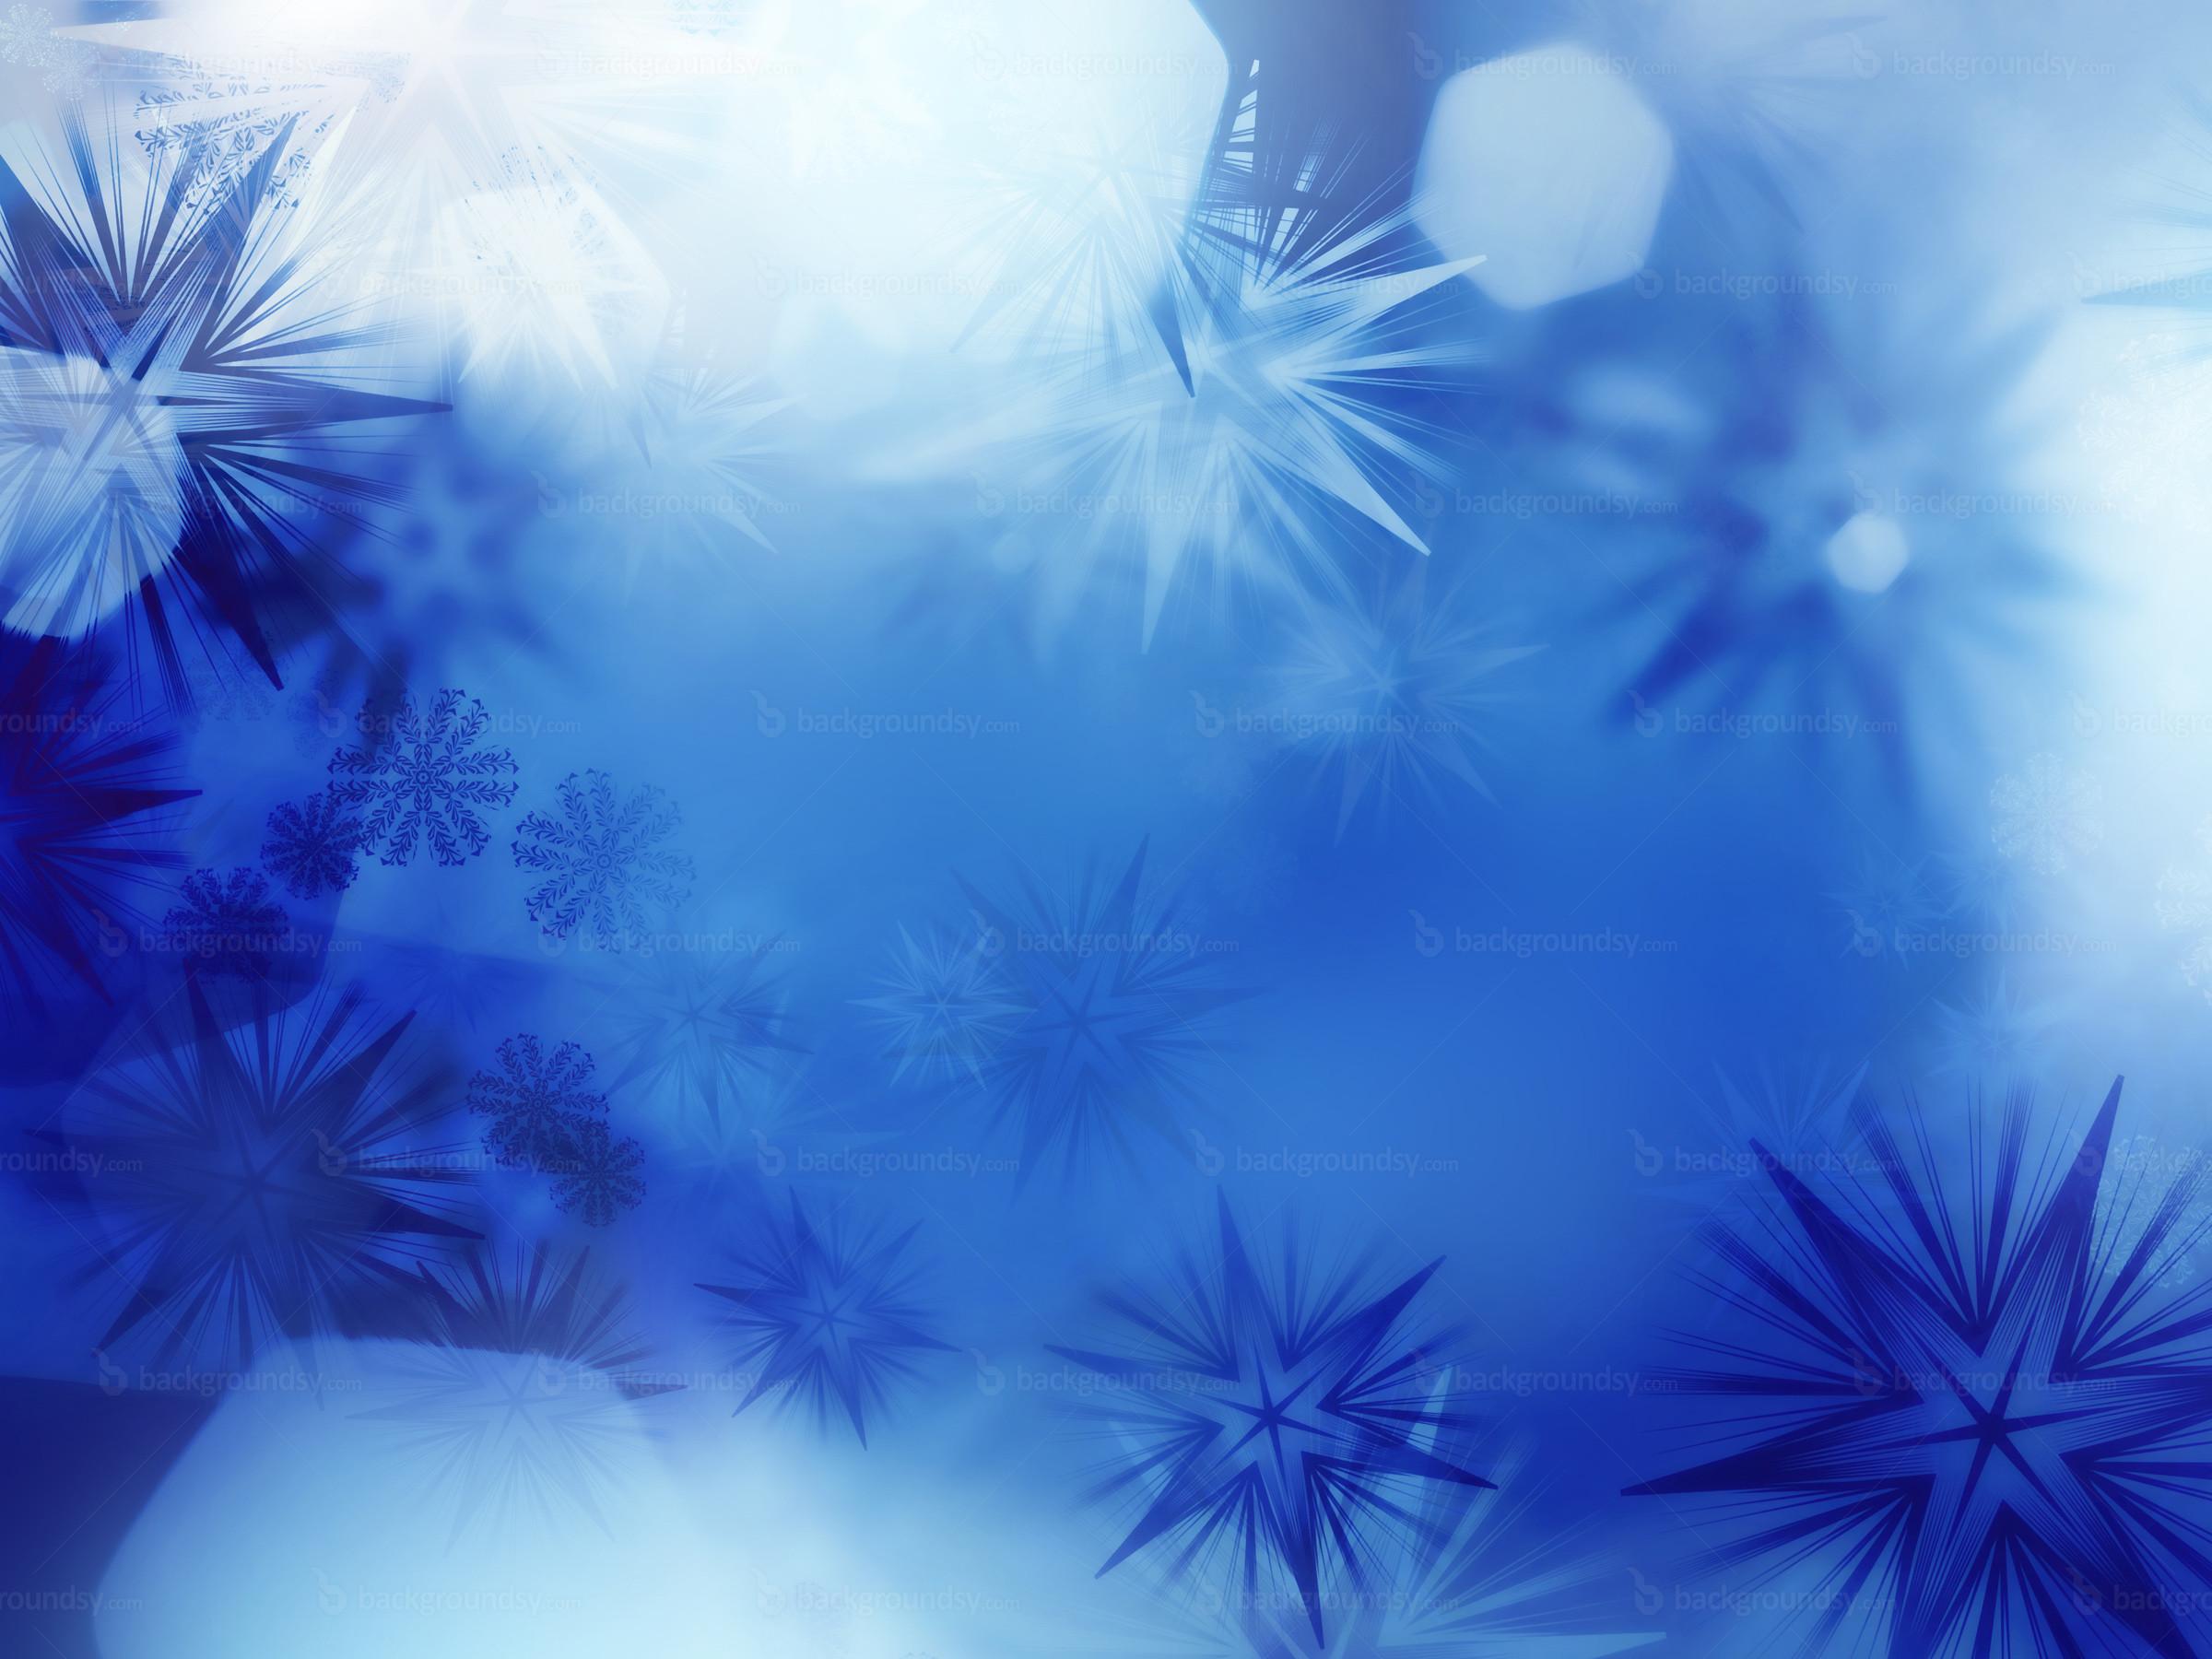 Winter Backgrounds For Desktop 57 Pictures